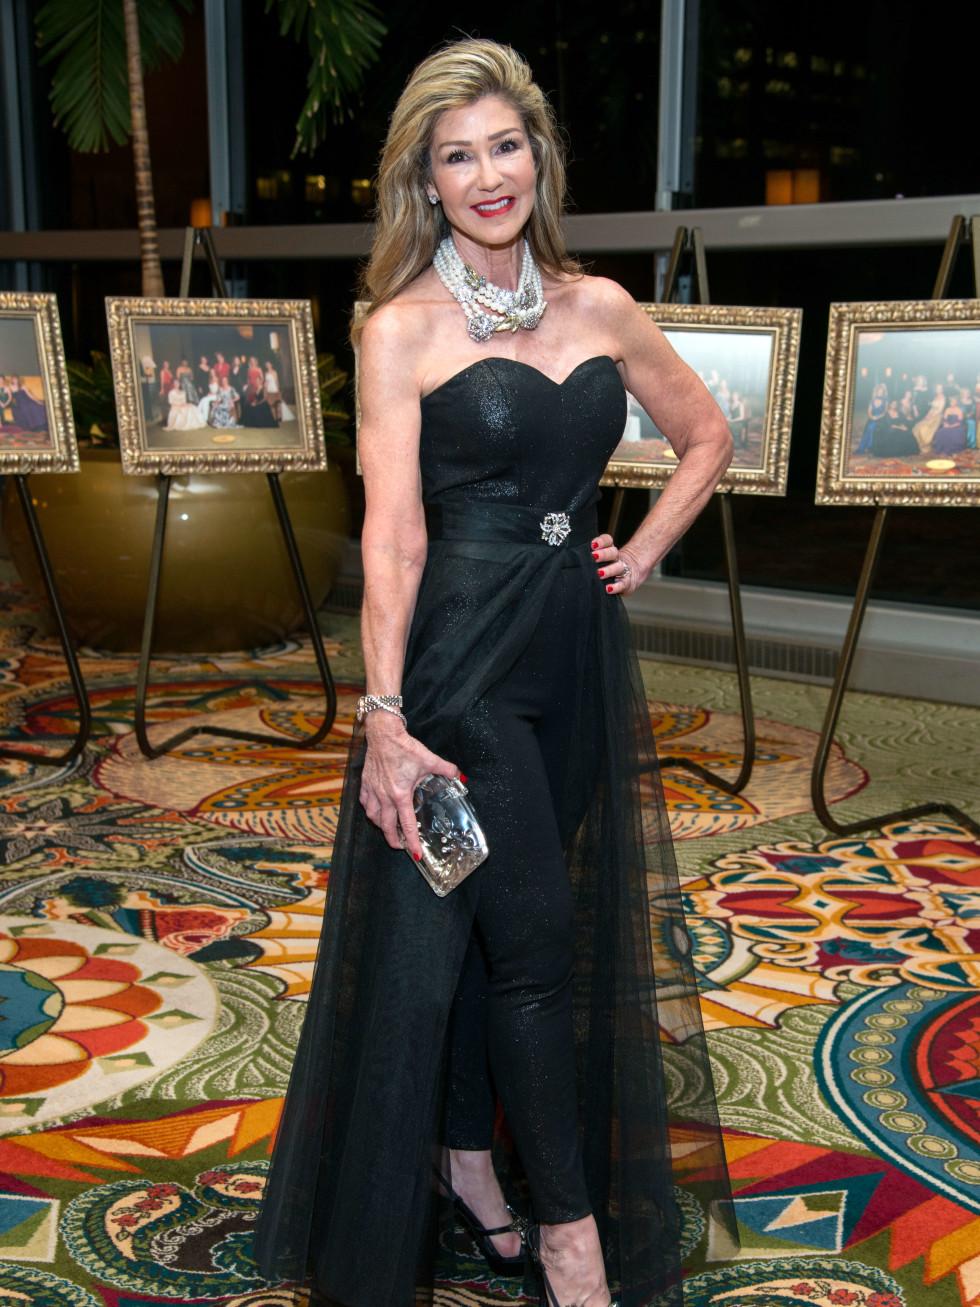 Houston, Women of Distinction fashionable gowns, Feb 2017, Patti Murphy